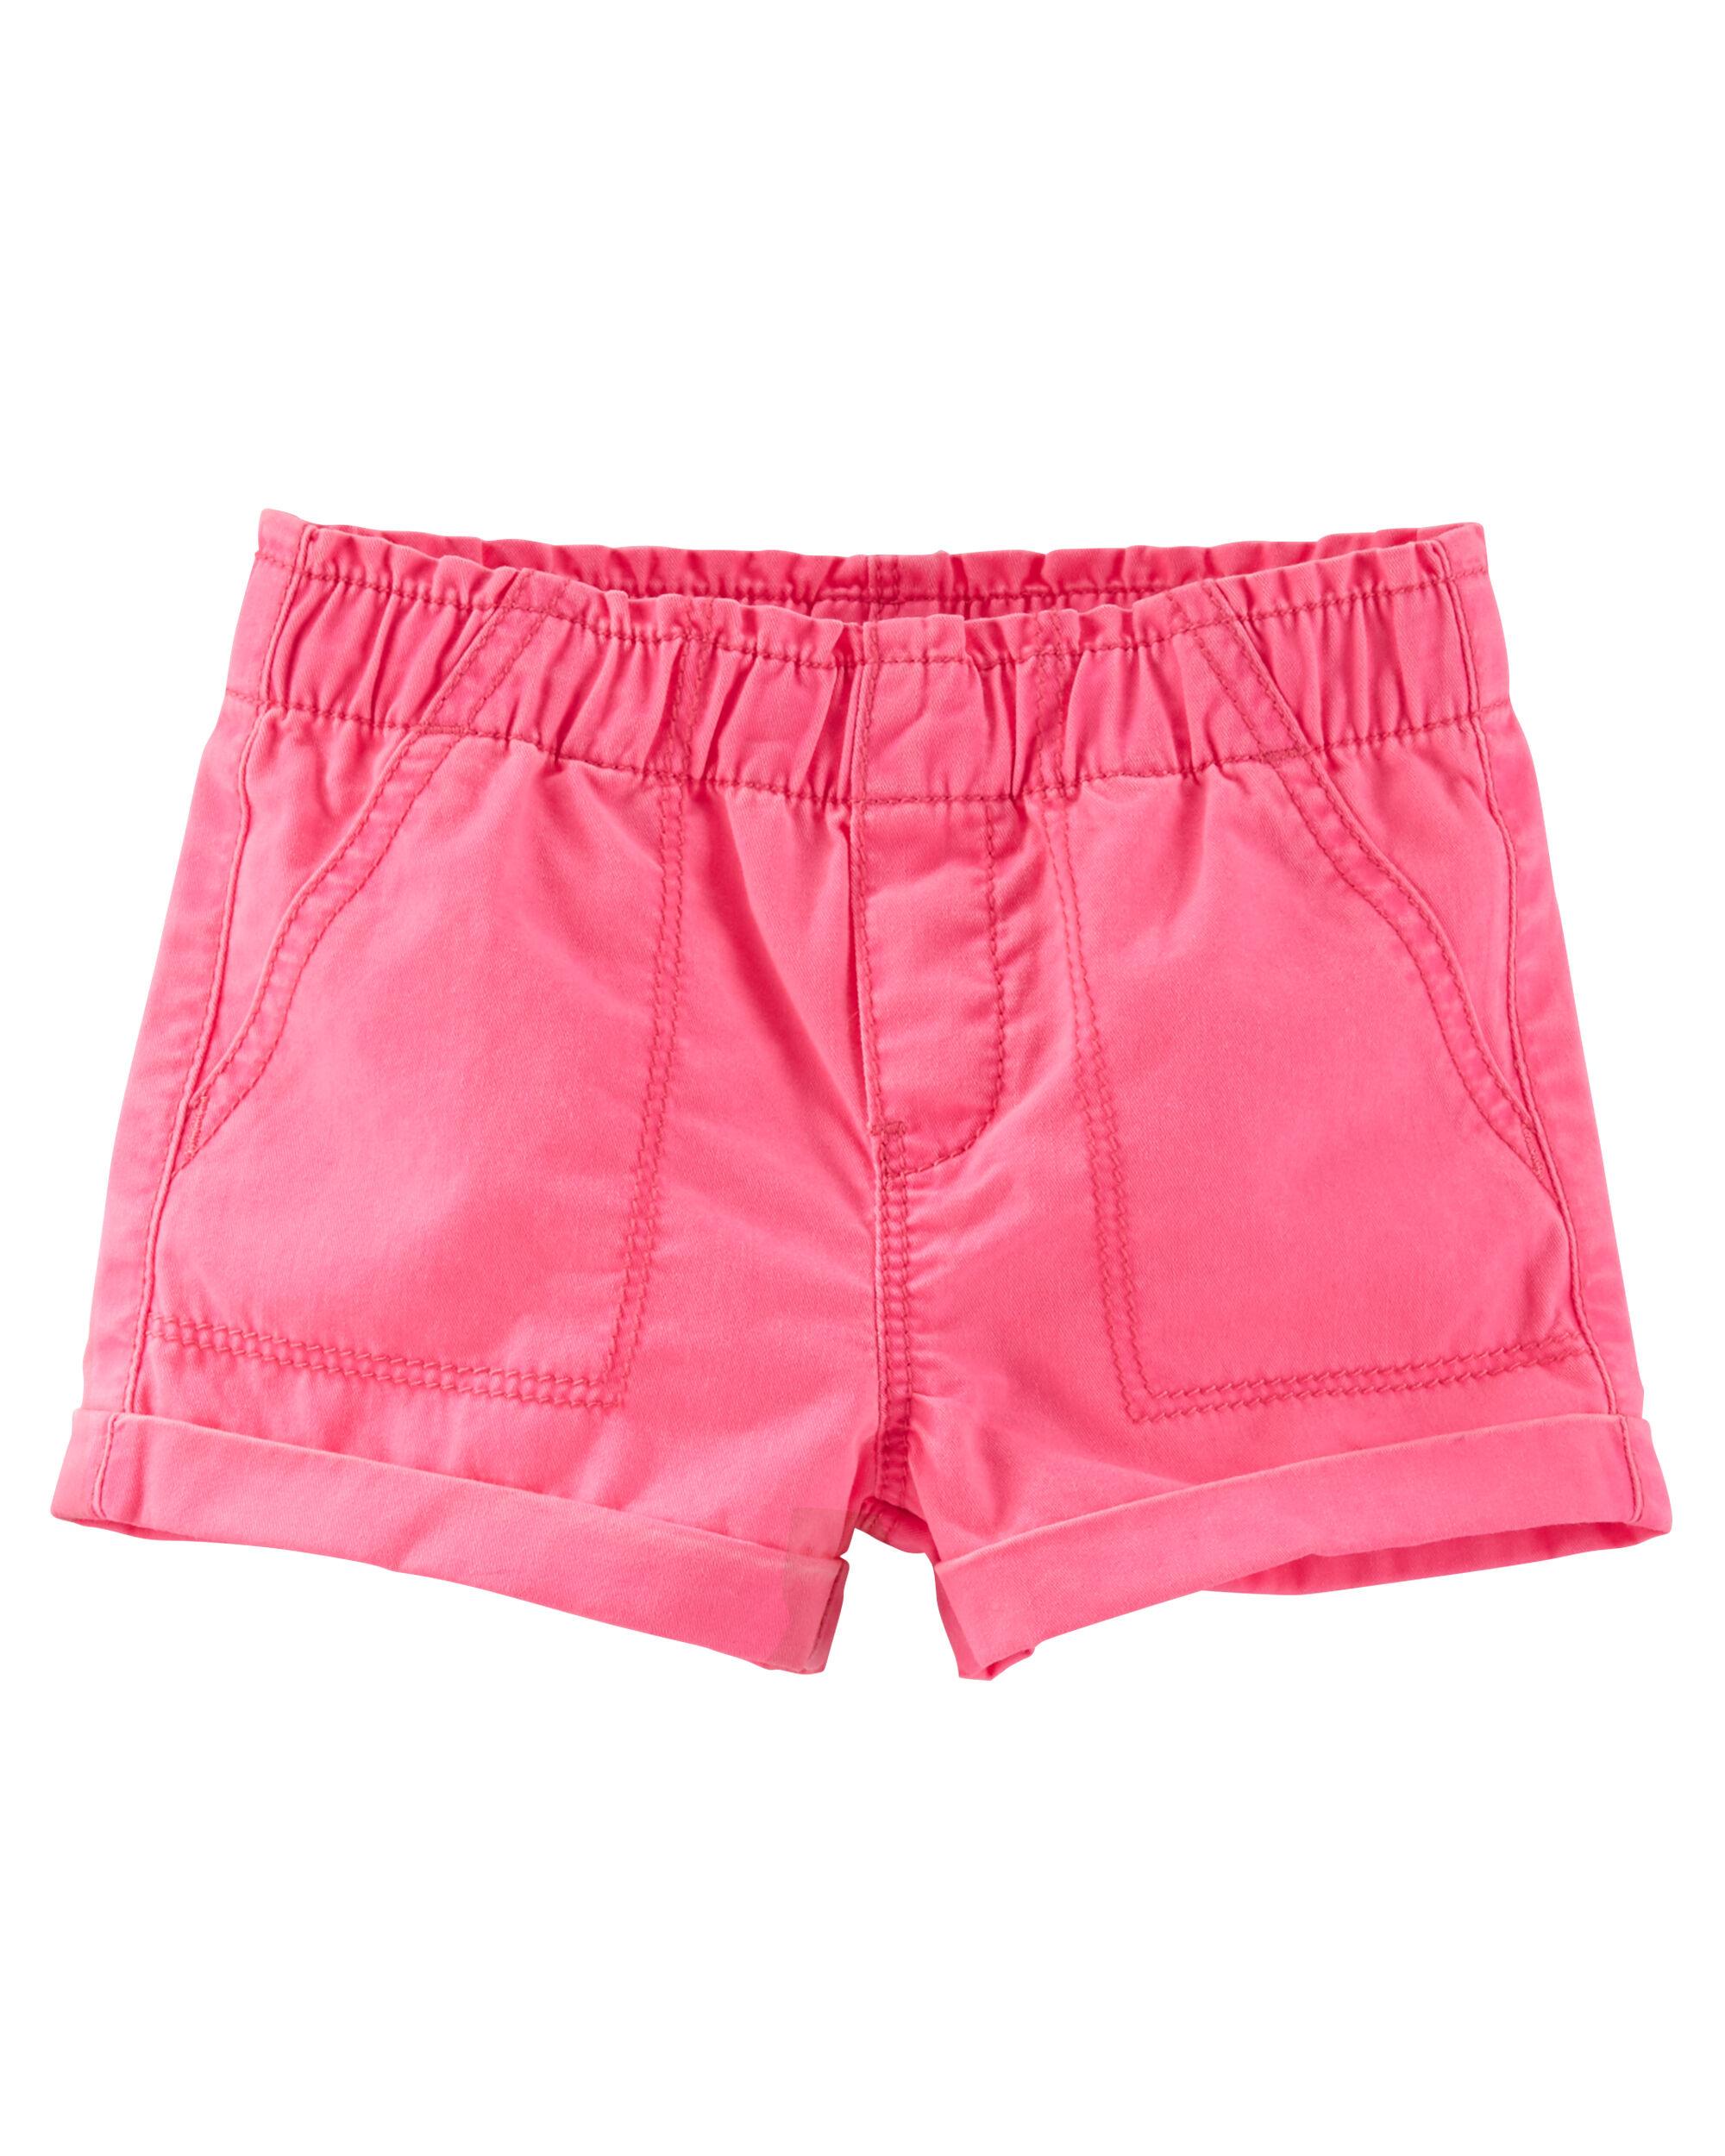 Pull-On Neon Twill Shorts